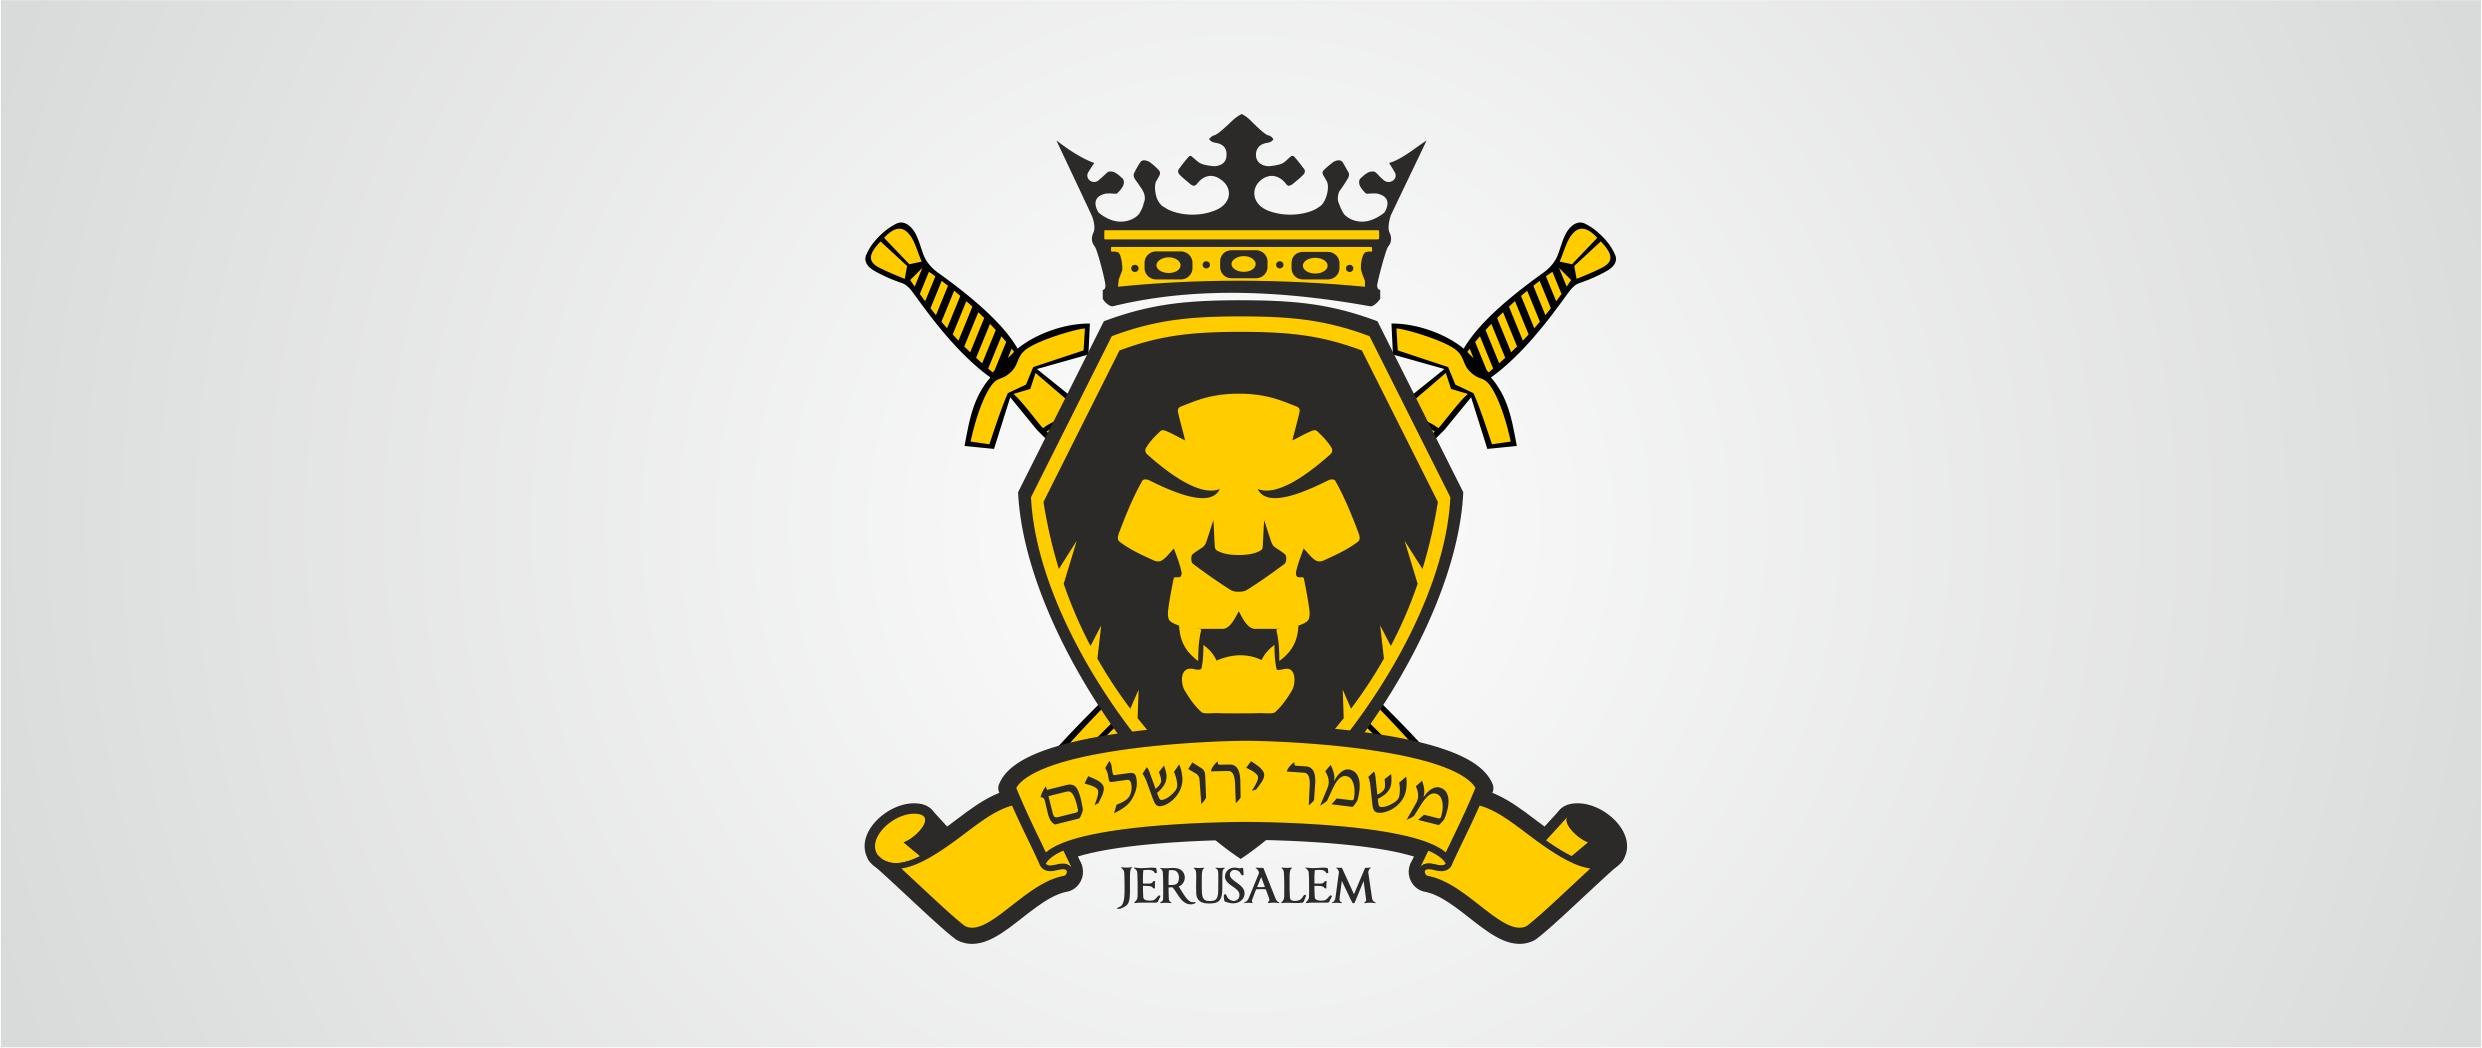 Разработка логотипа. Компания Страж Иерусалима фото f_31151e89de6f3611.jpg